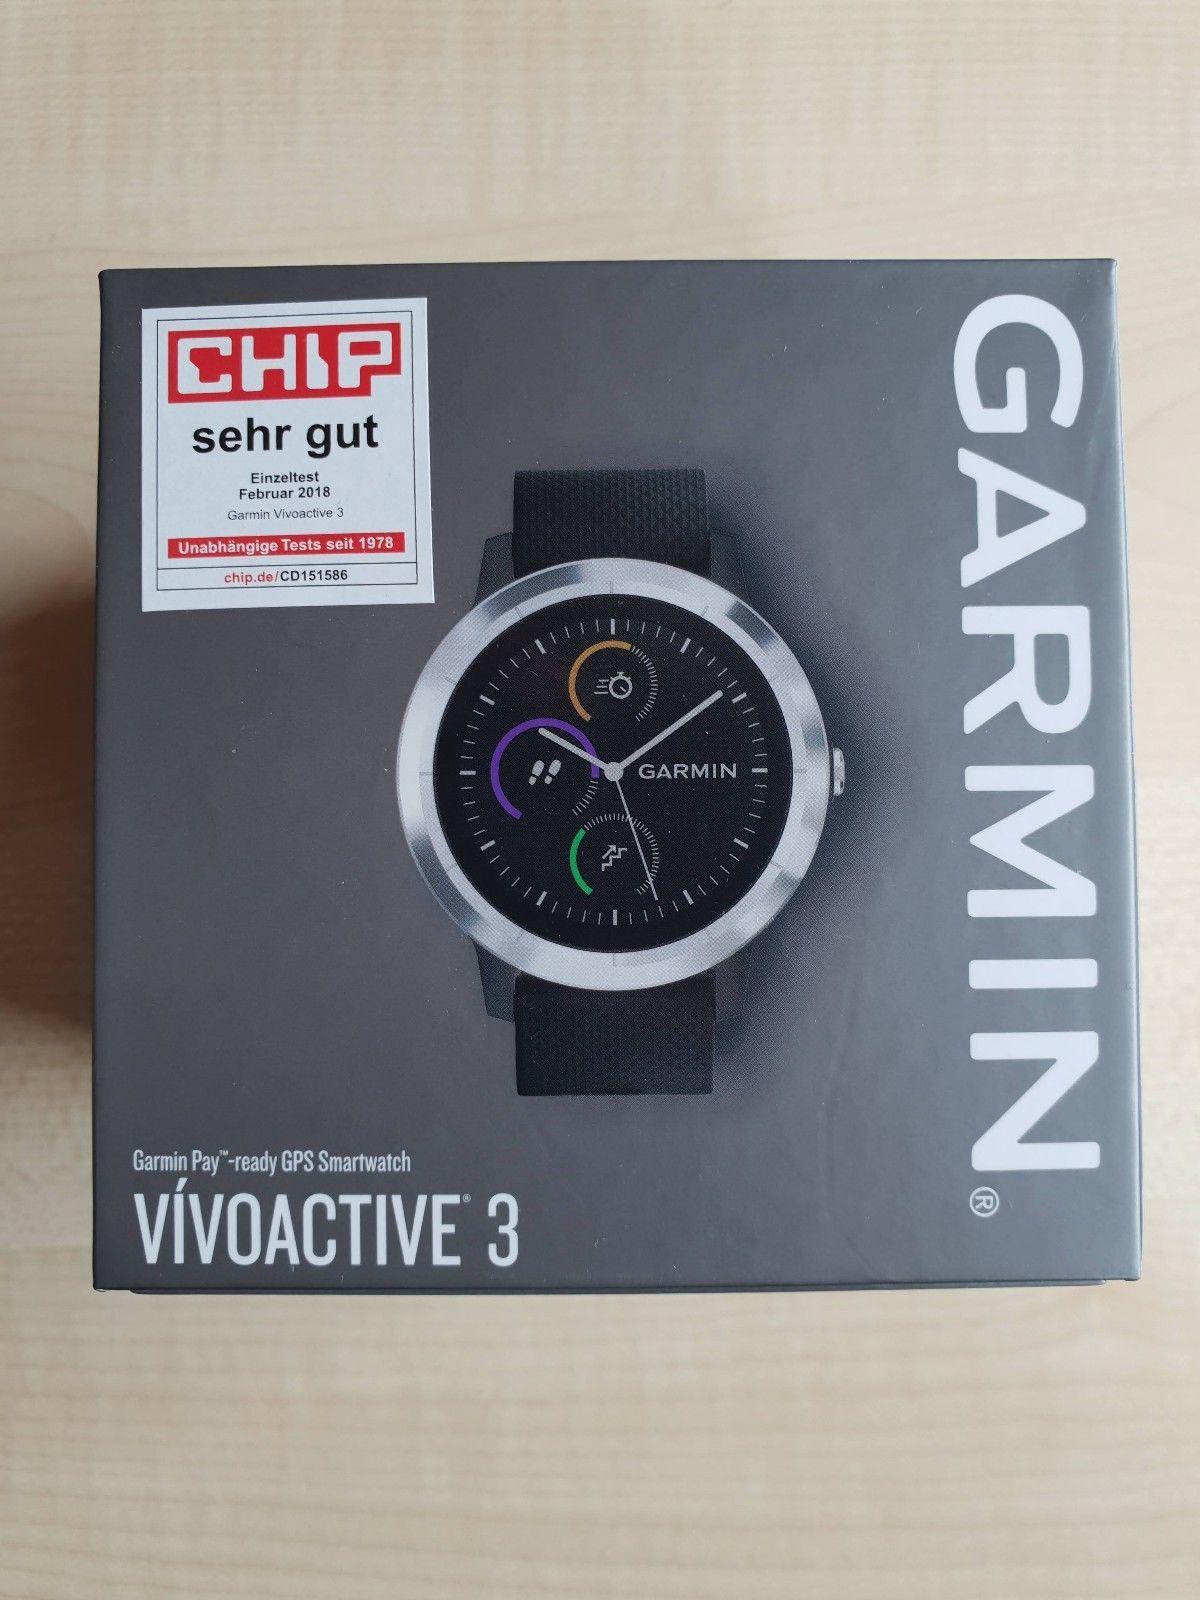 Garmin Vivoactive 3 - GPS Smartwatch - Original Verpackung - Kaufdatum: 23.03.18